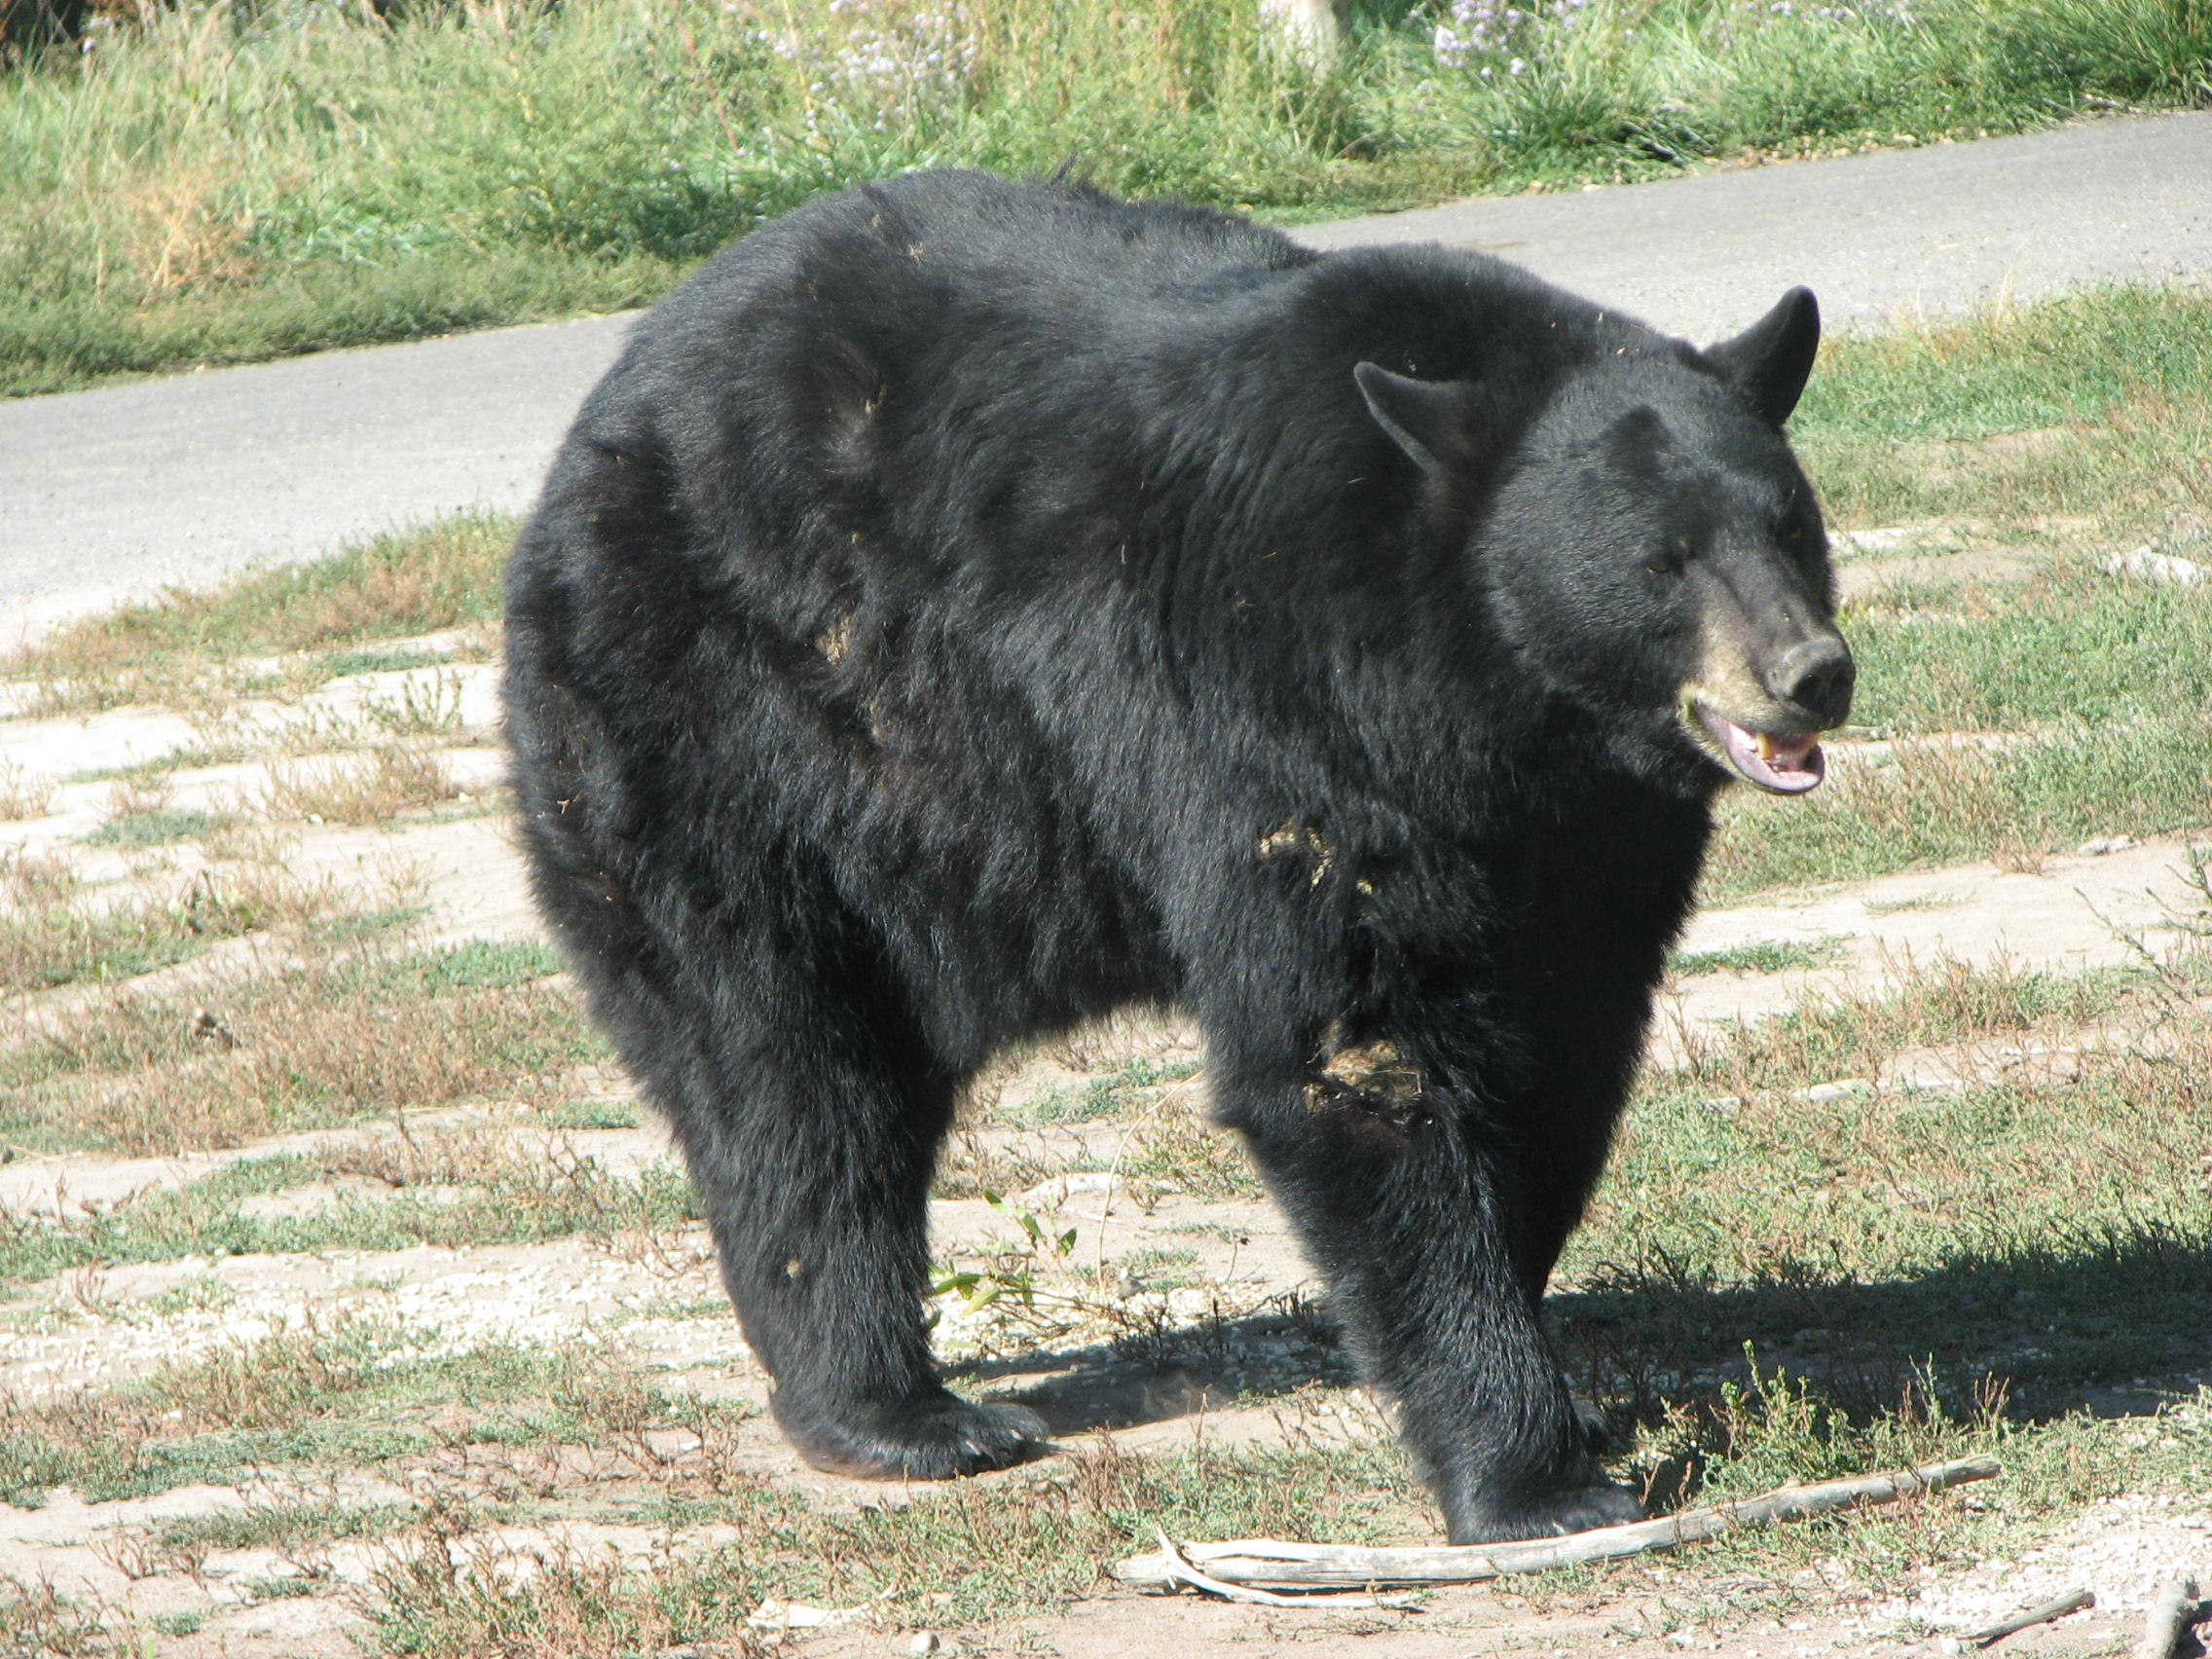 File:American Black Bear.JPG - Wikimedia Commons